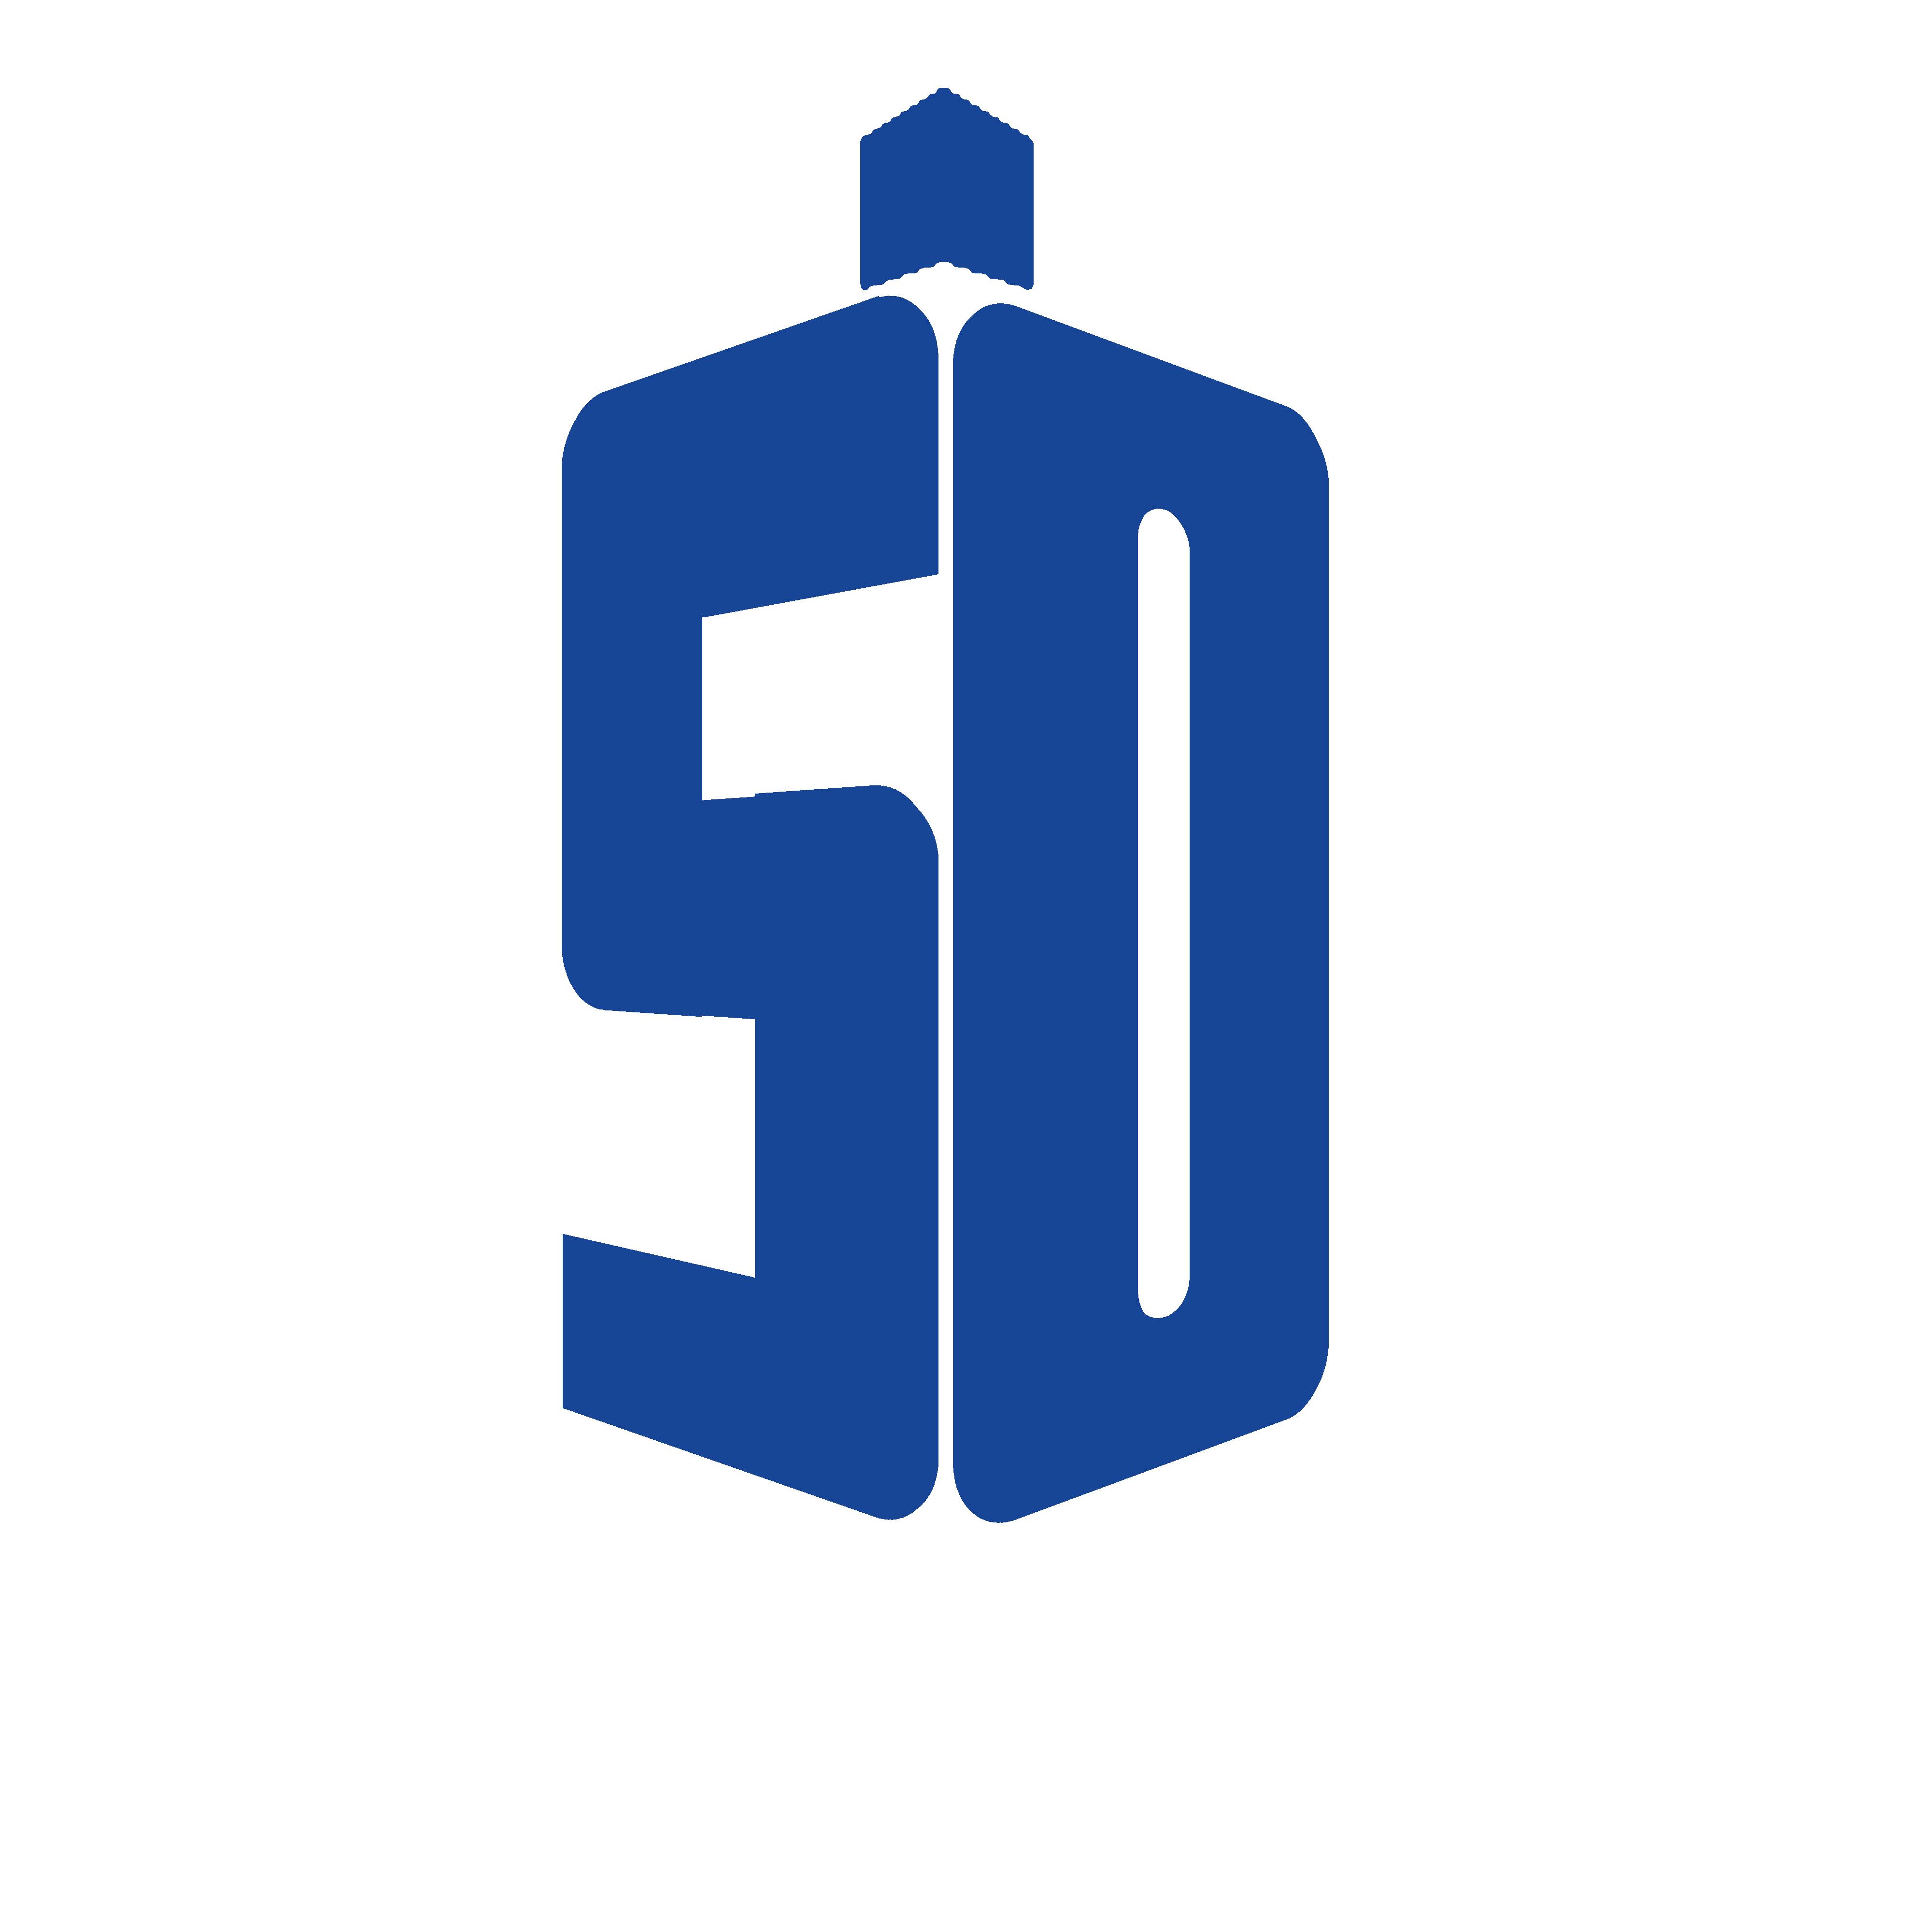 Dw logo clipart jpg Free Doctor Logo Cliparts, Download Free Clip Art, Free Clip Art on ... jpg